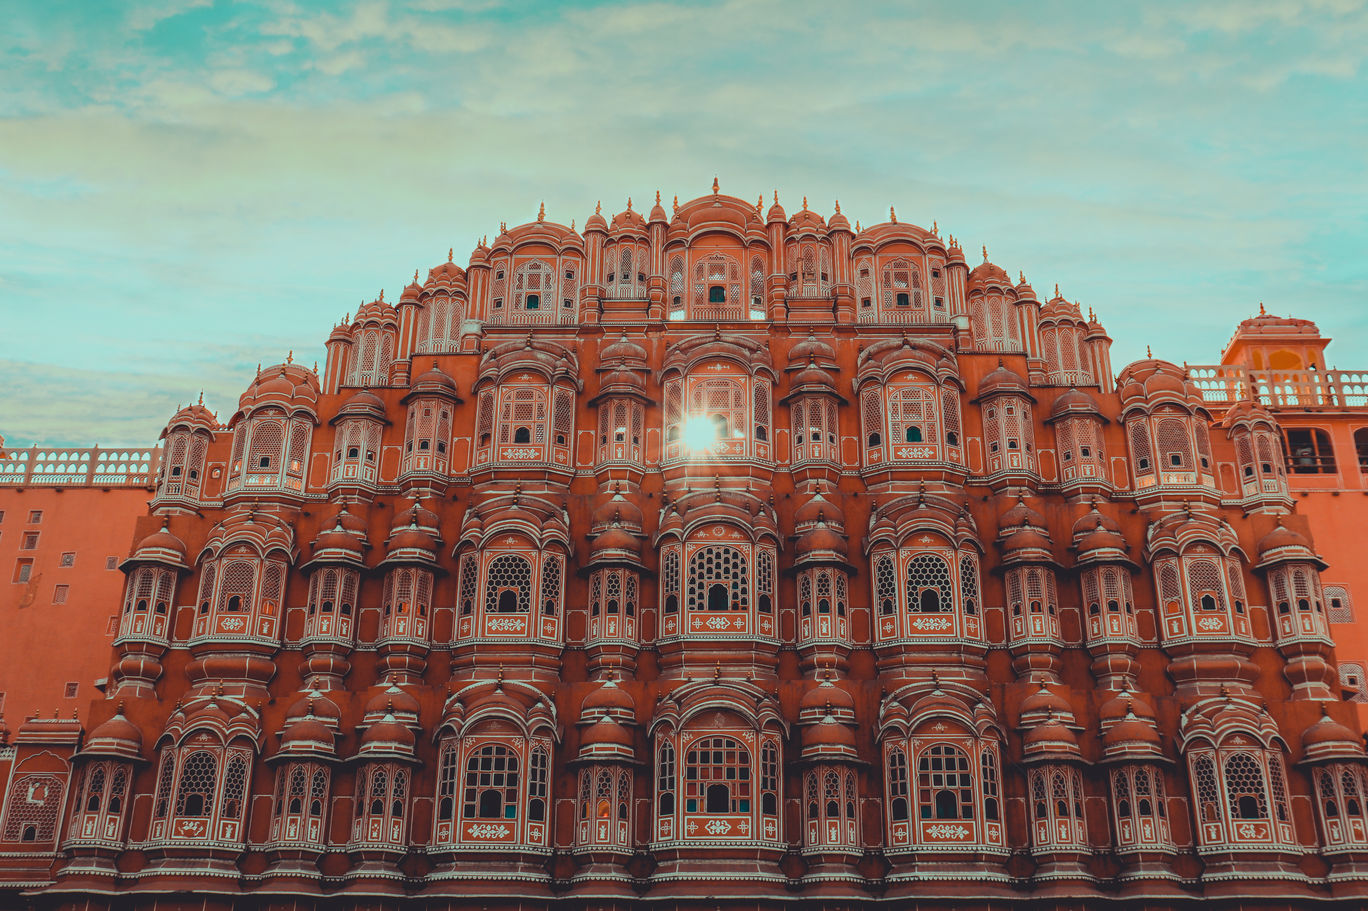 Photo of Hawa Mahal By Pranav Prabhakar